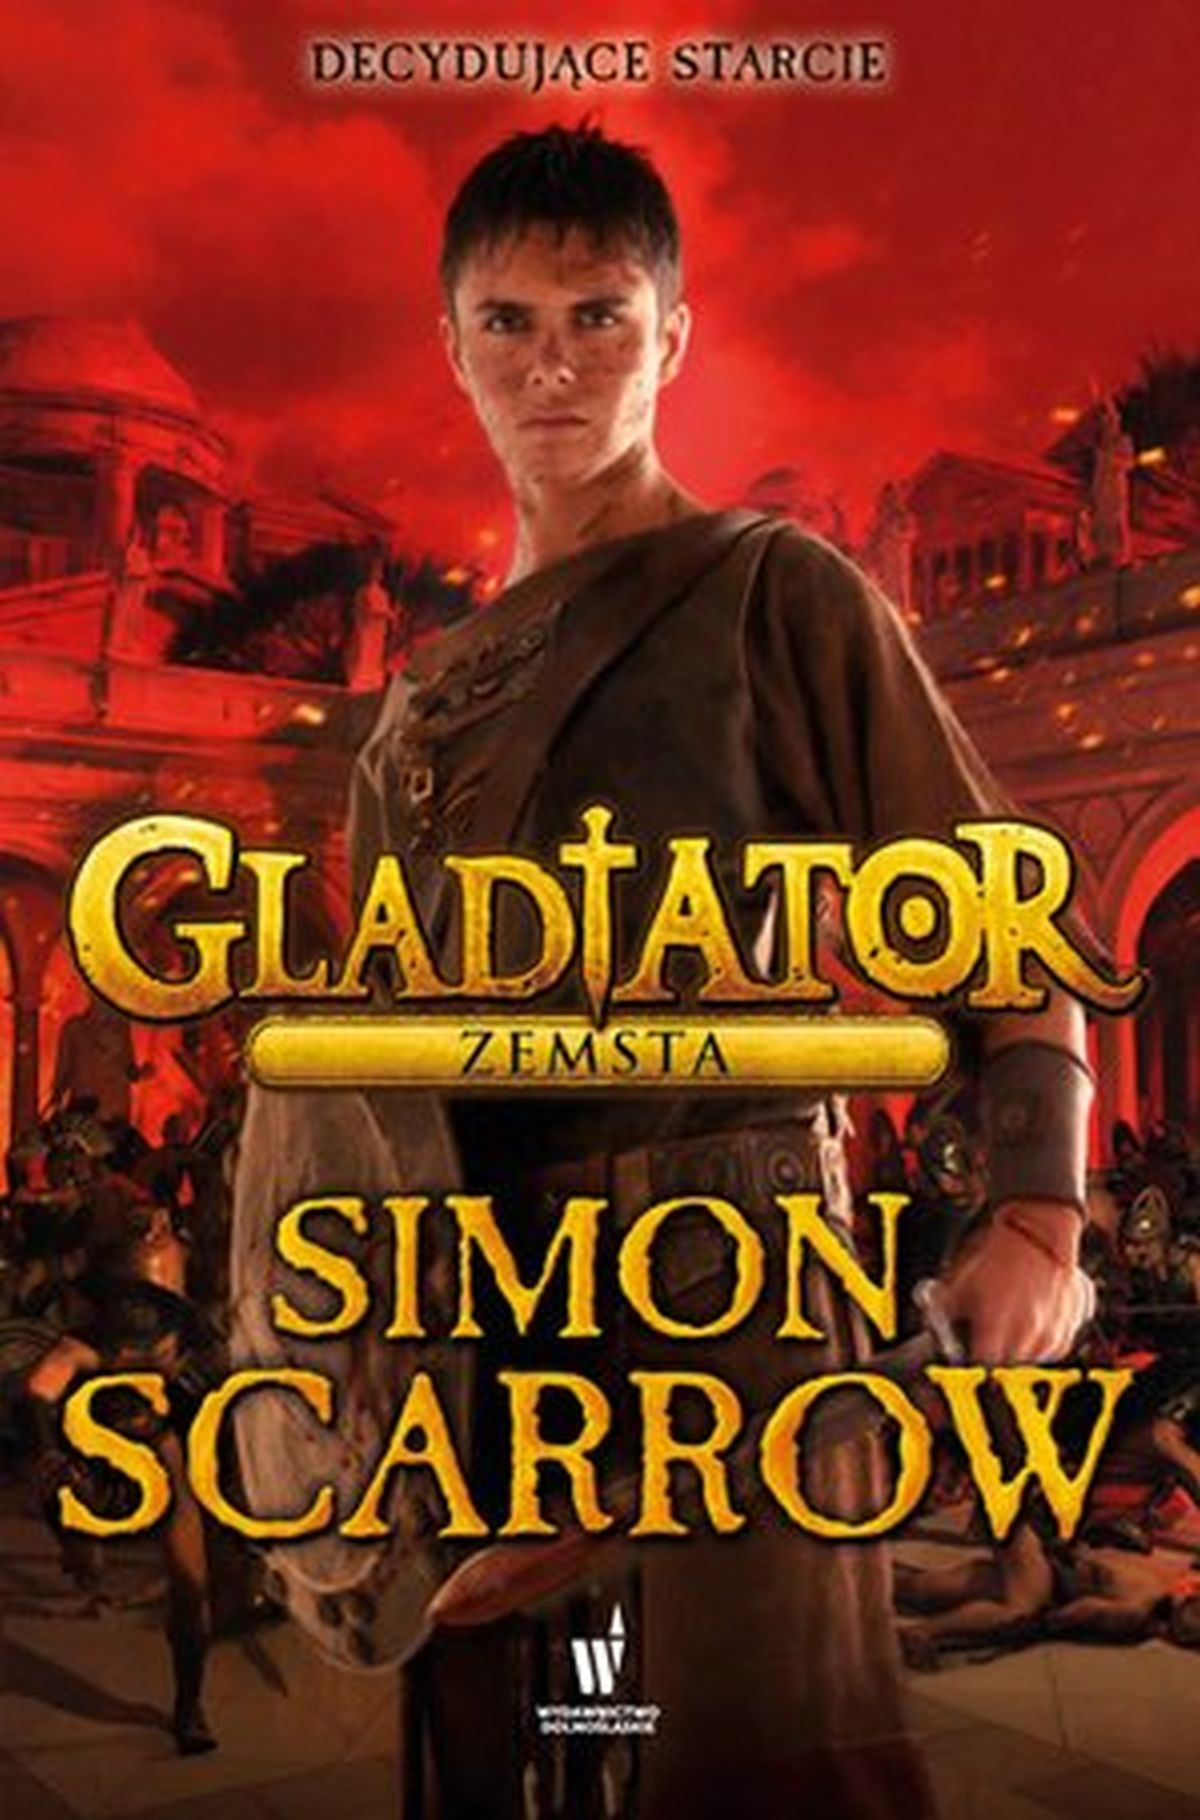 Simon Scarrow, Gladiator. Zemsta